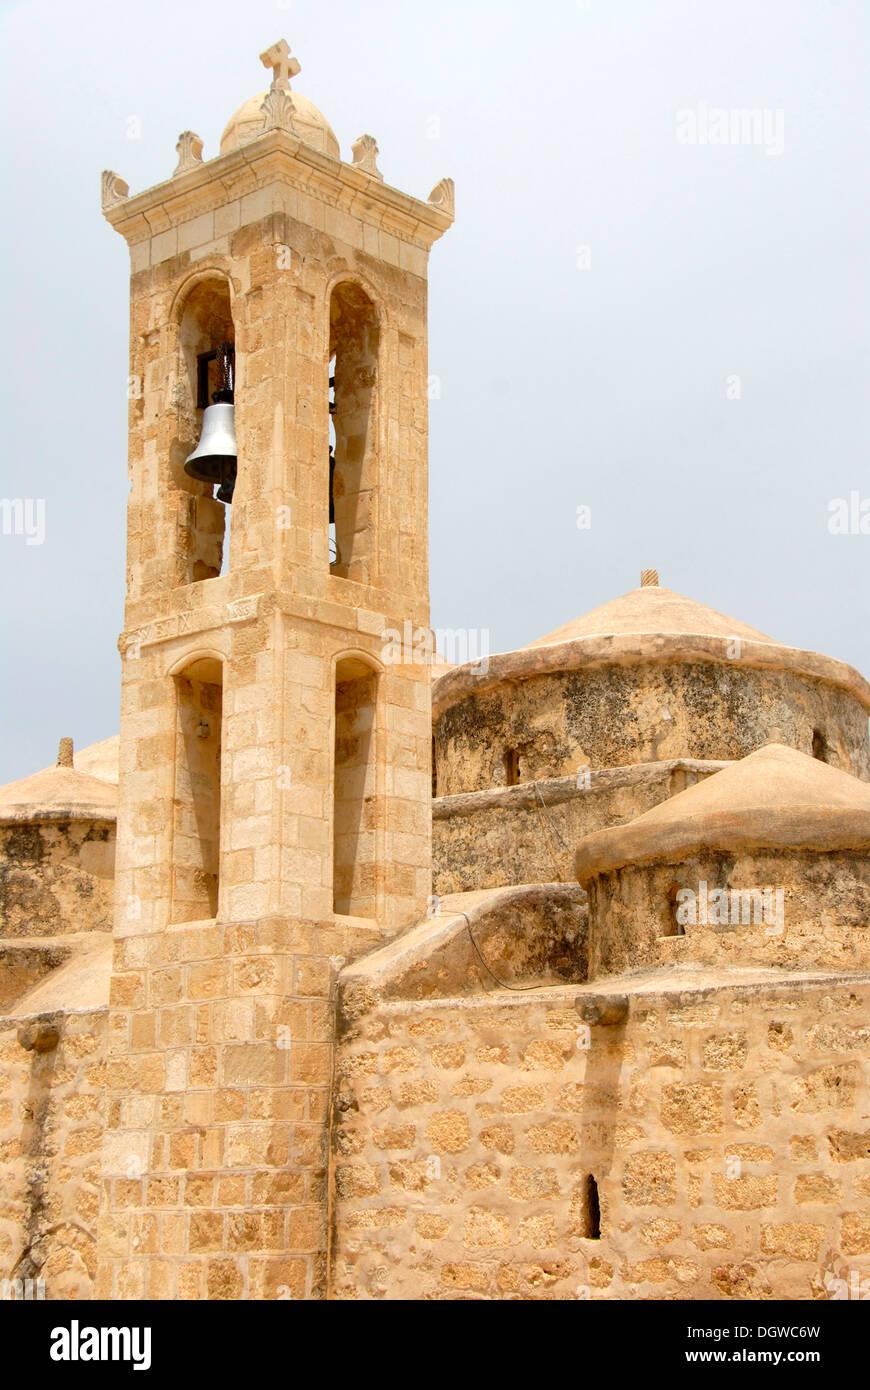 Greek Orthodox Christianity, church and steeple, Agia Paraskevi, Geroskipou near Paphos, Pafos, Southern Cyprus - Stock Image